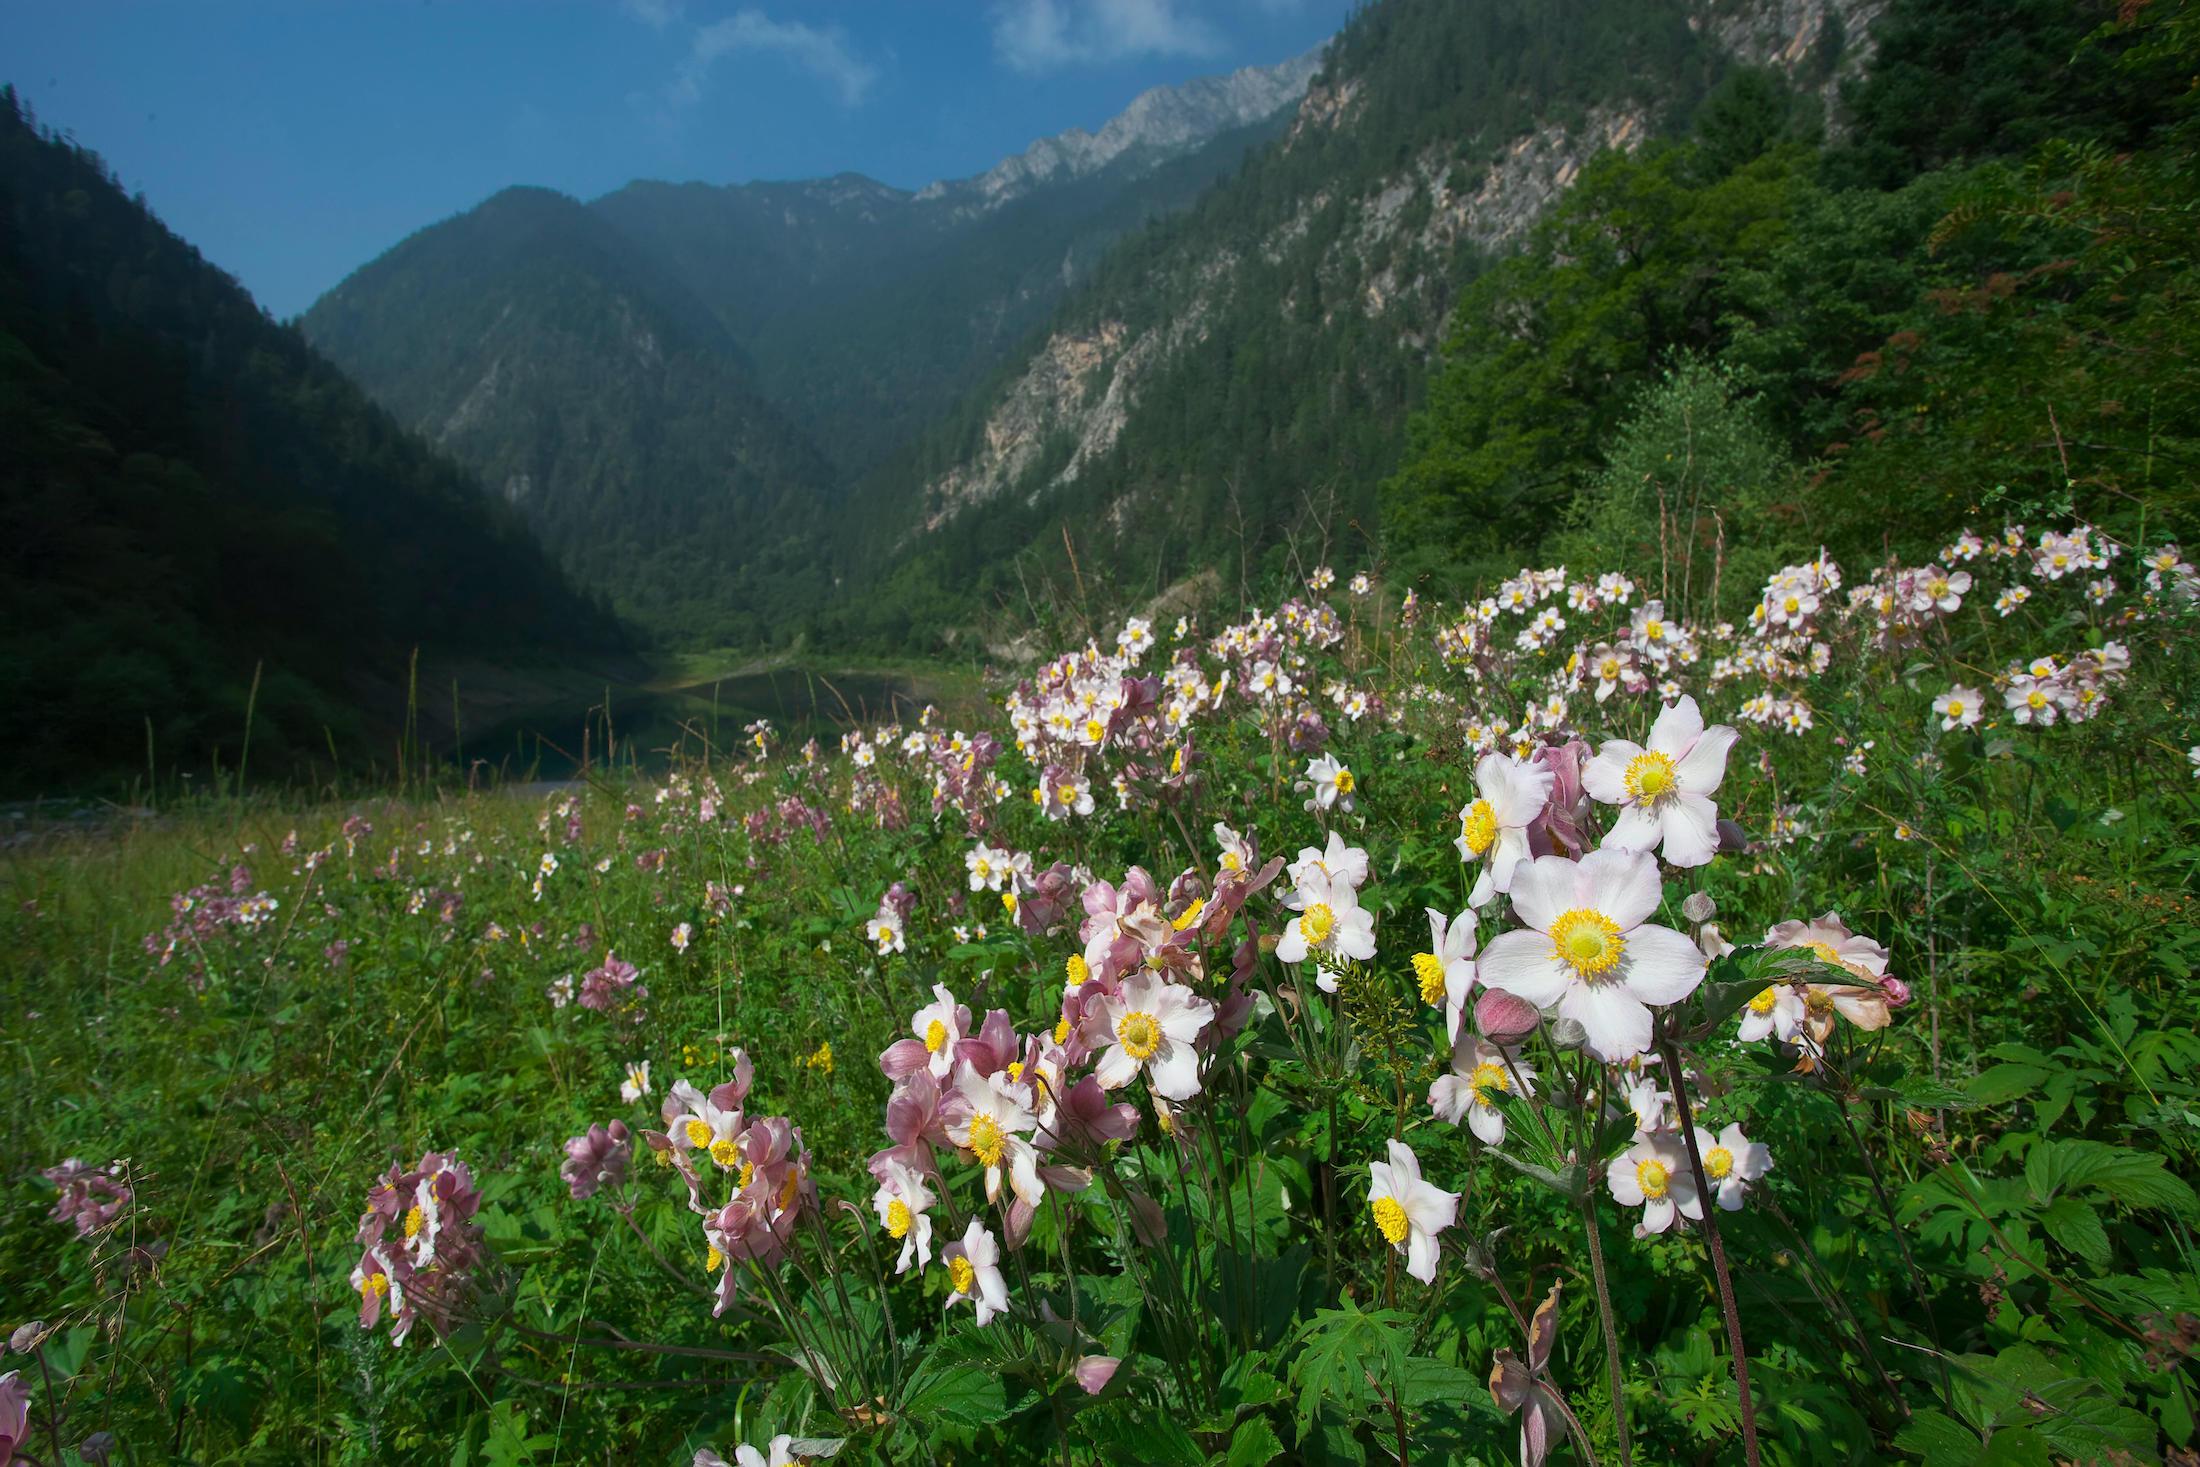 Grapeleaf anemone flower on a sunny hilldside, Jiuzhaigou